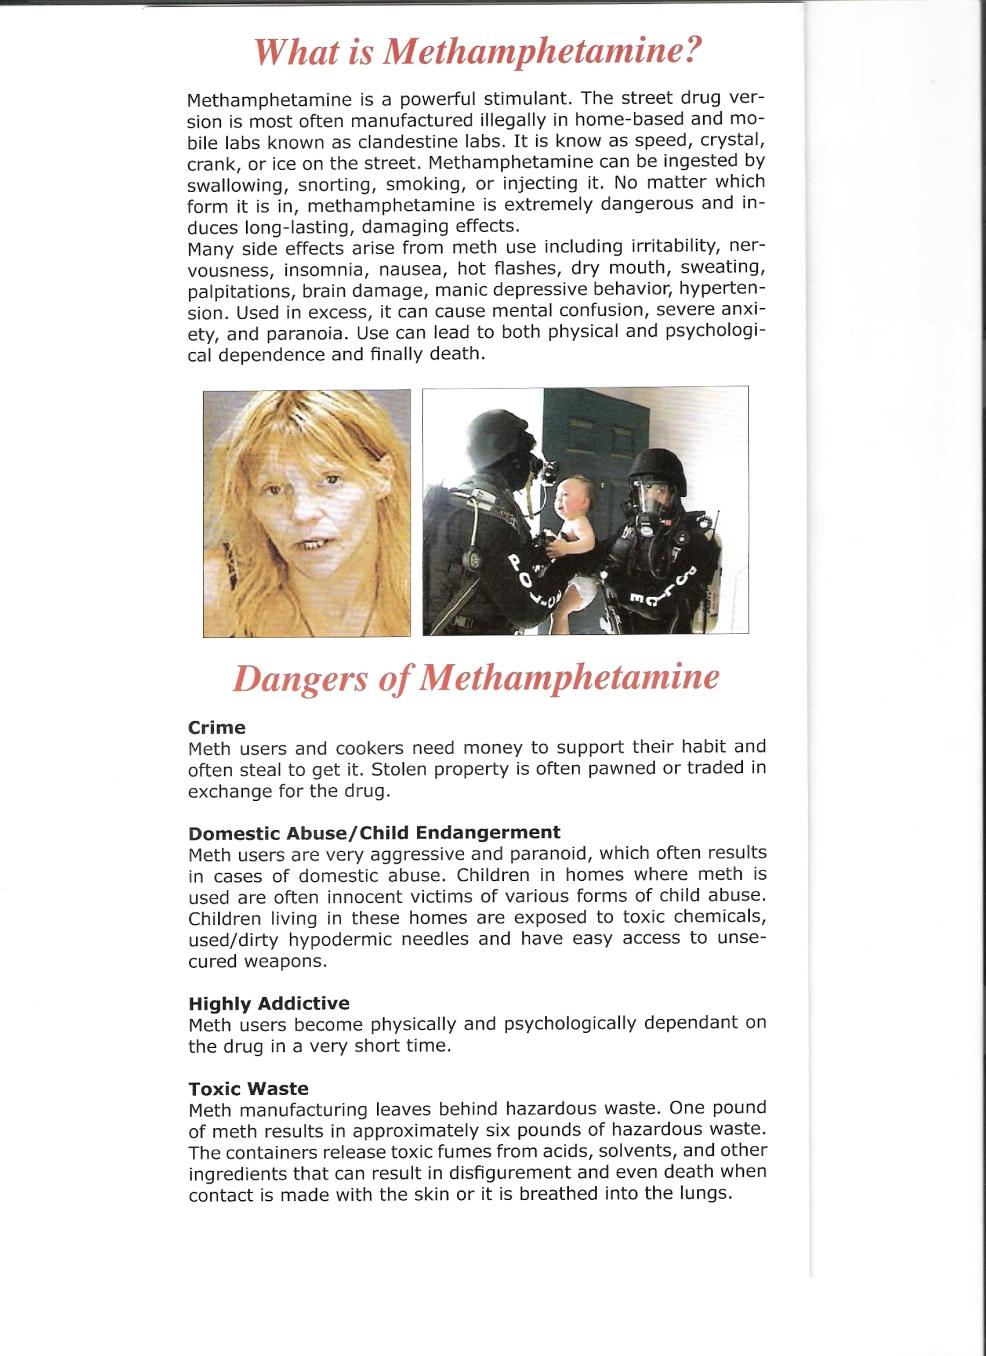 MethPamphlet